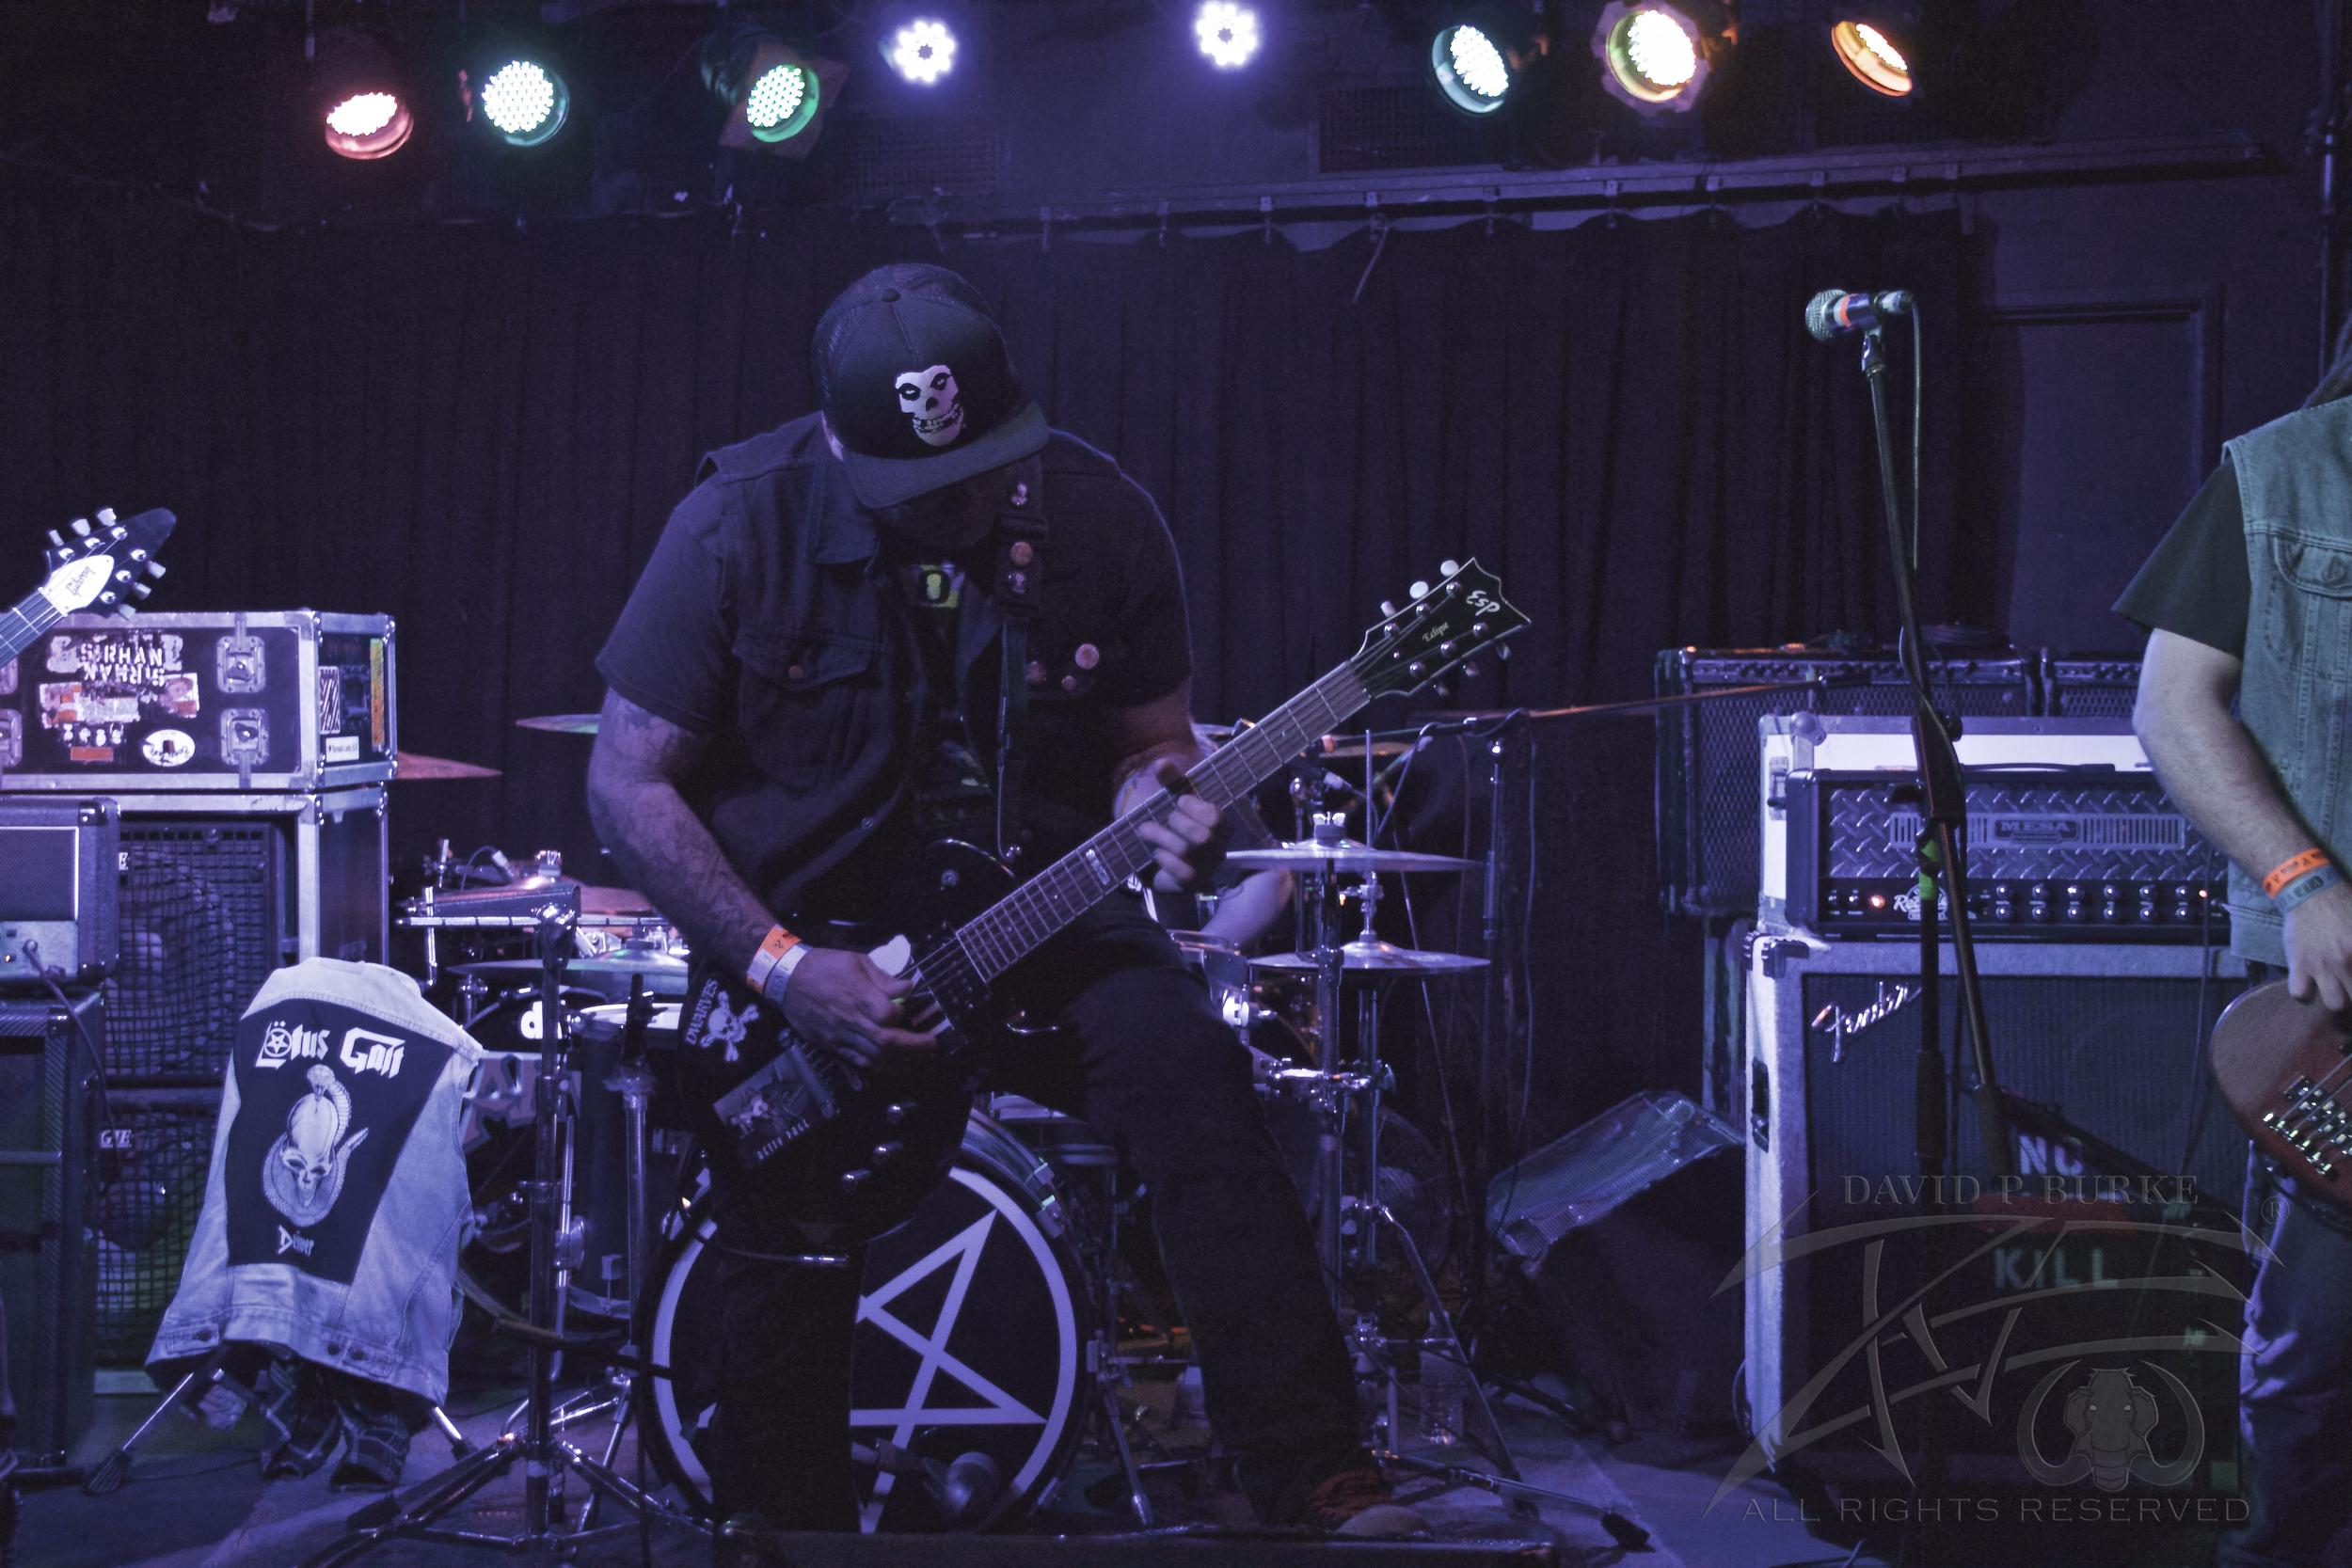 Lead vocalist/guitarist David Bartz  photo: David Burke